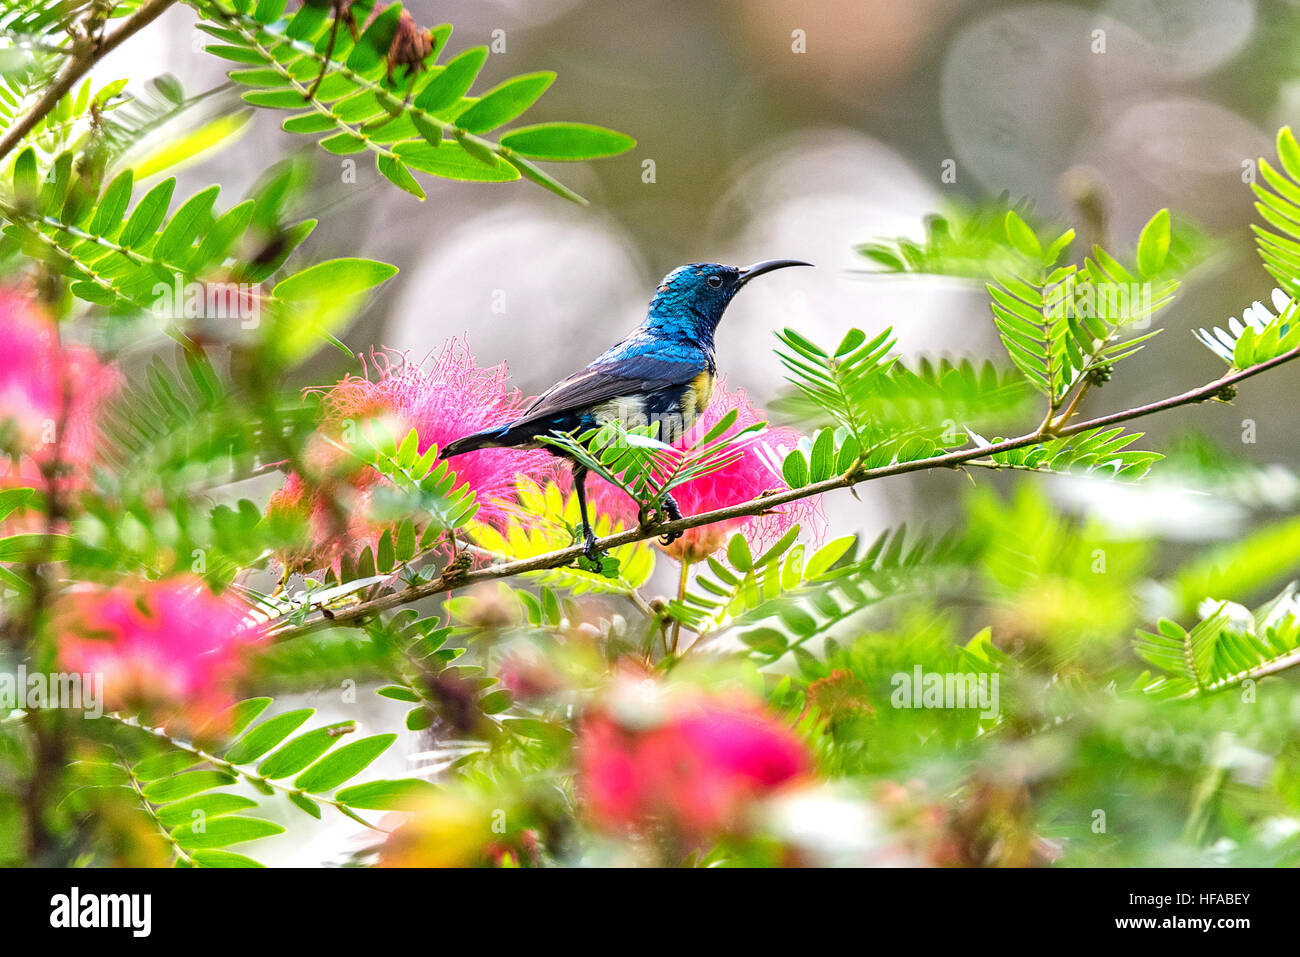 Colorful Sun-bird. - Stock Image